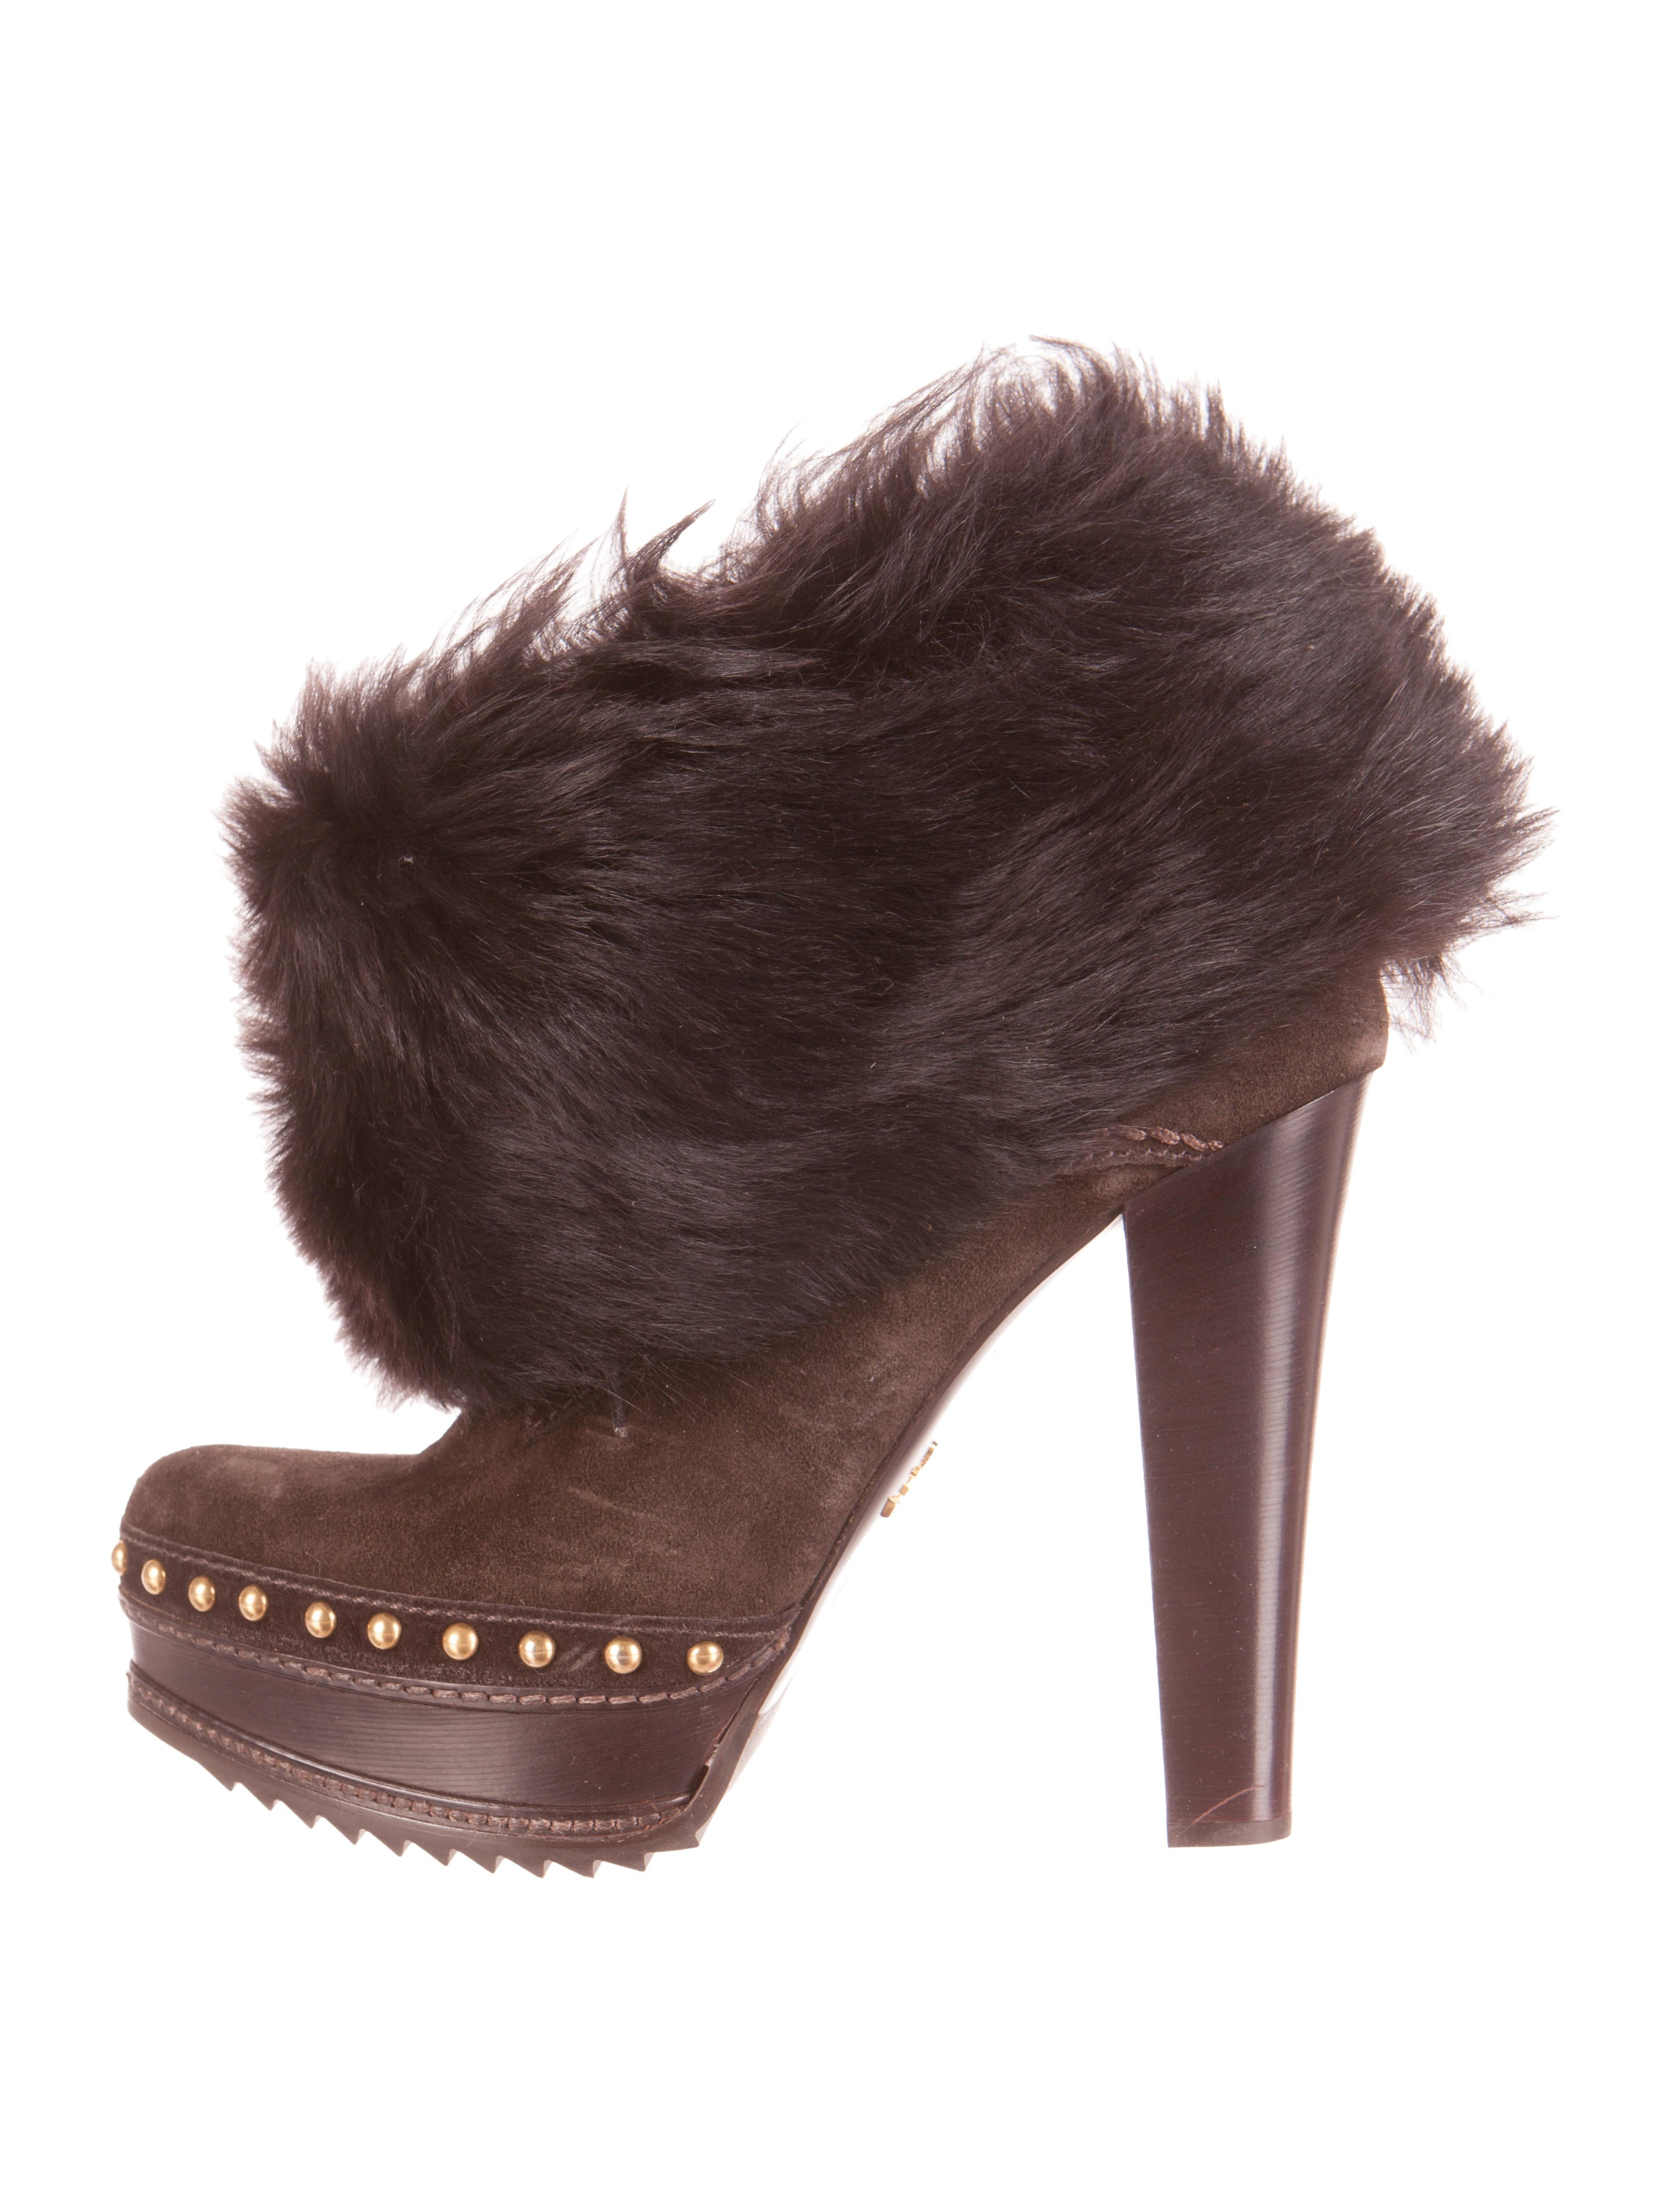 prada fur cuff platform ankle boots shoes pra71352